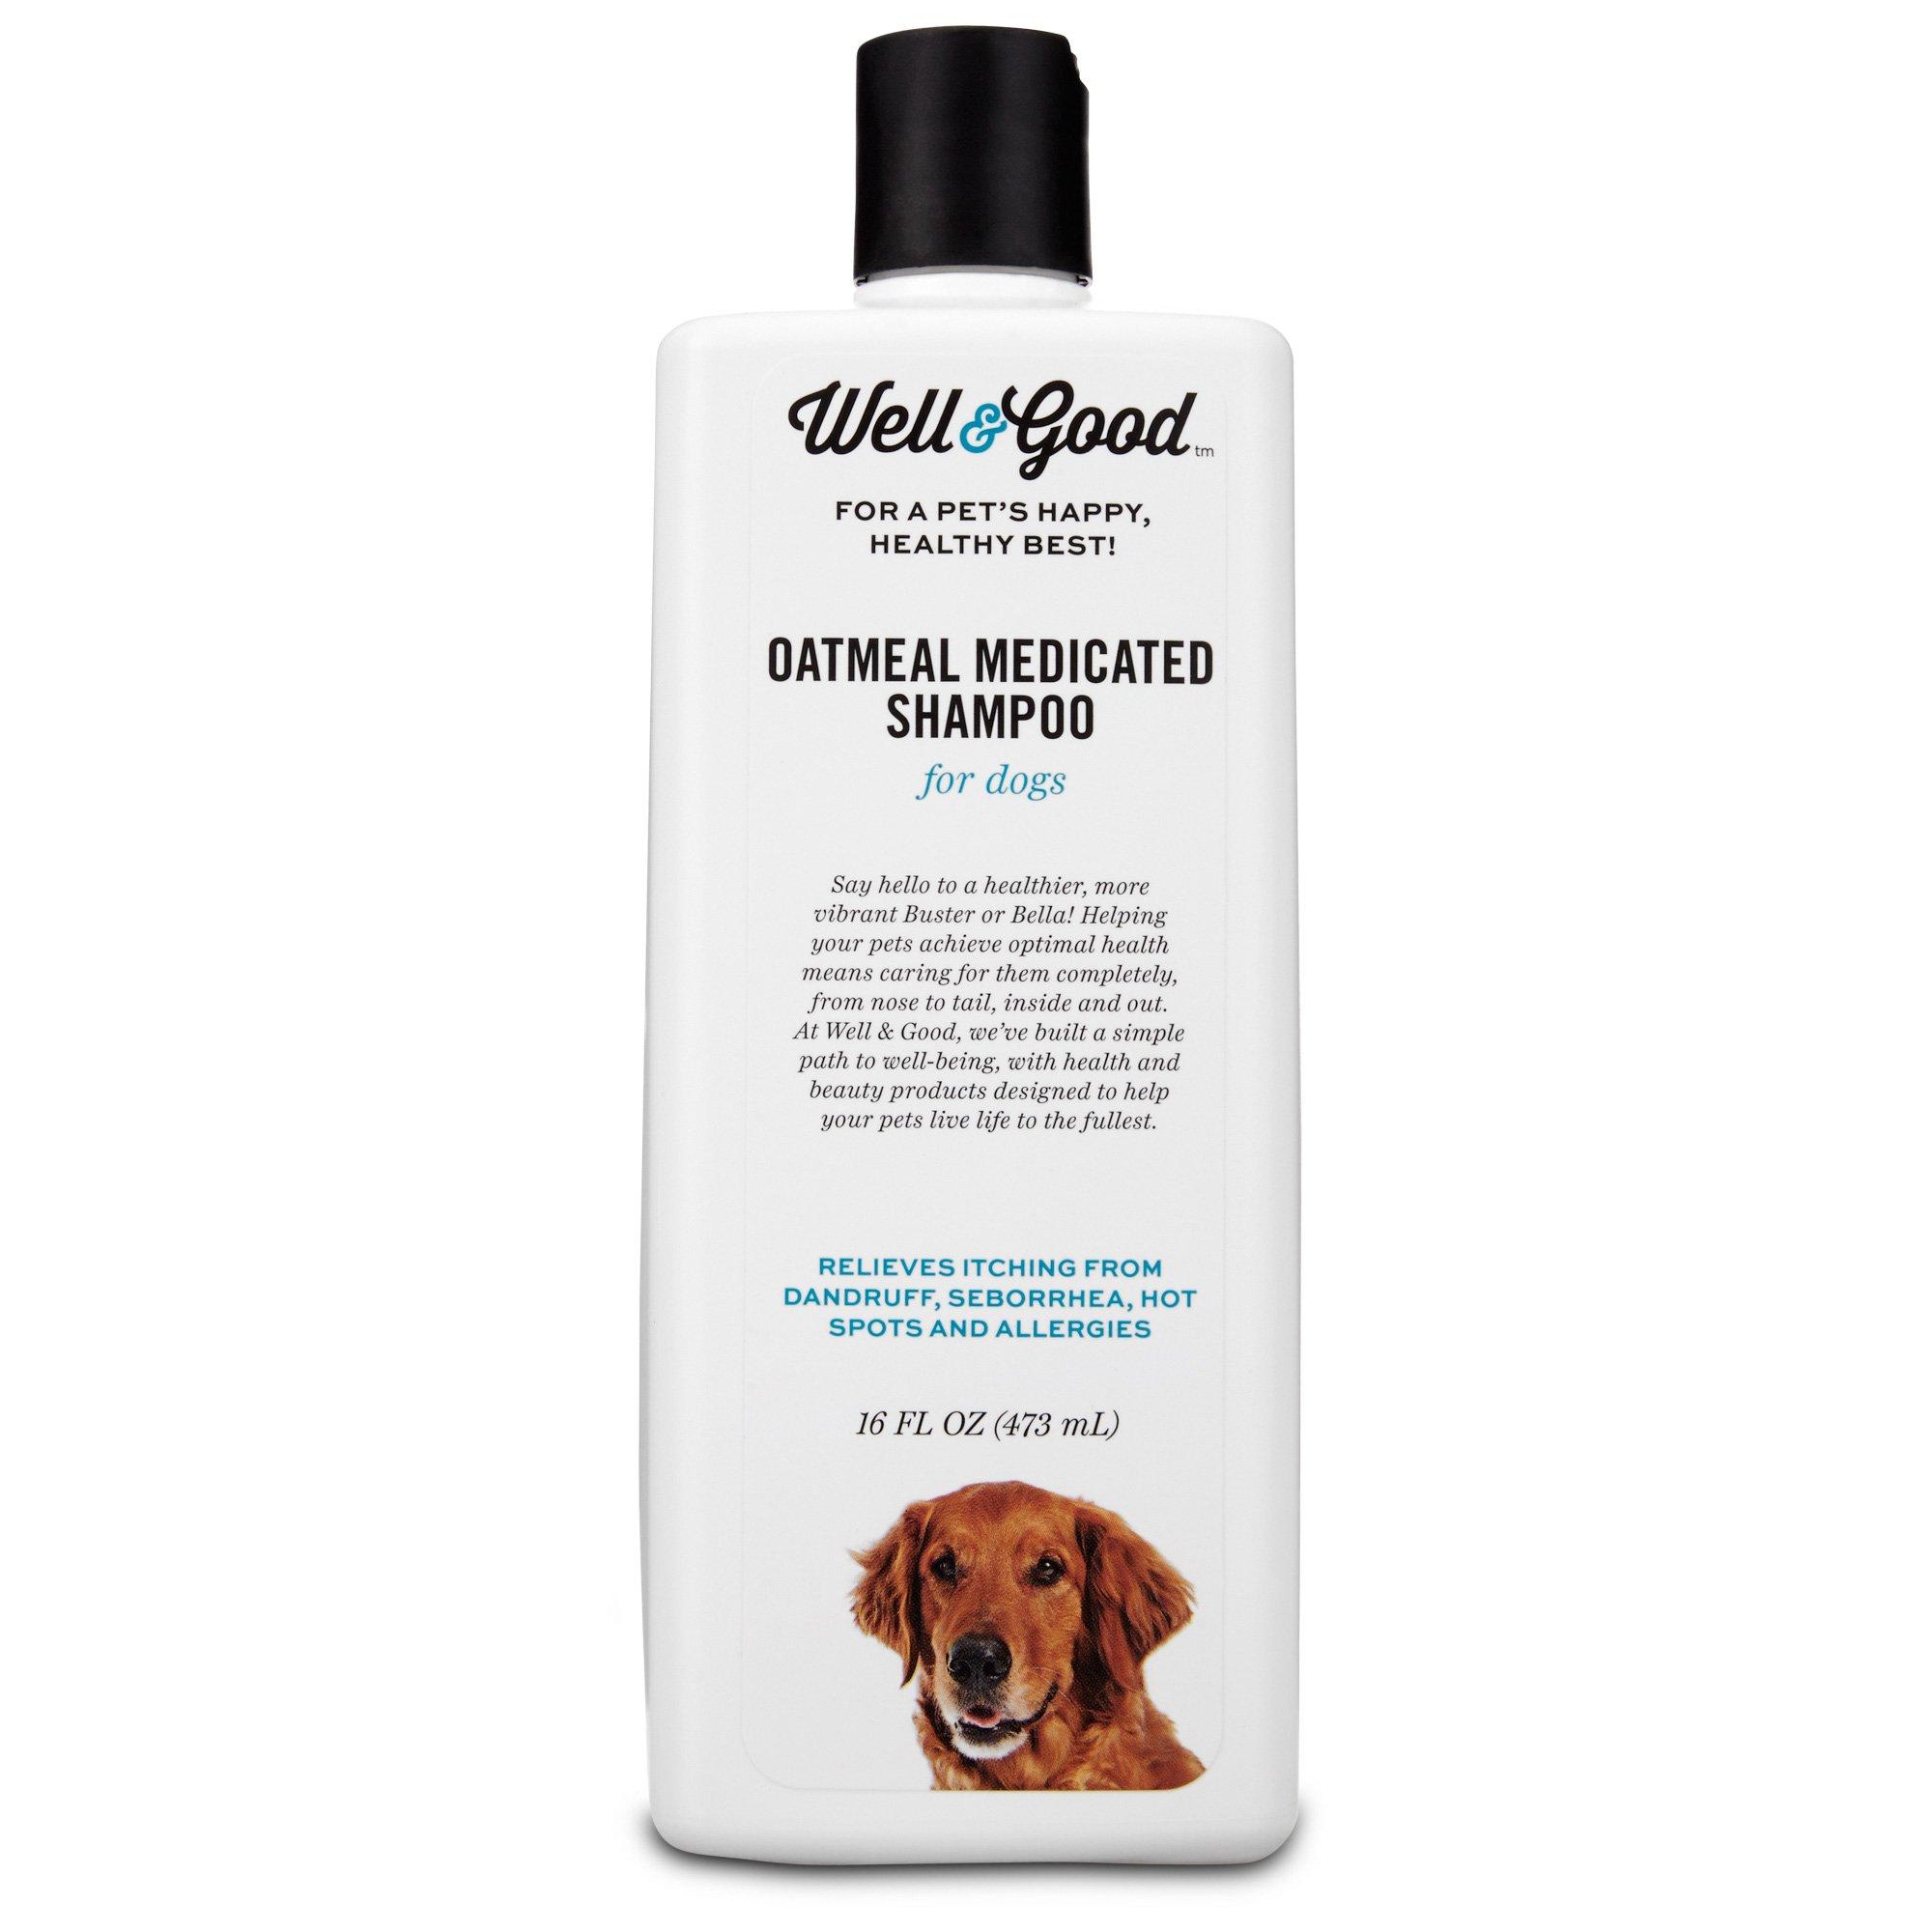 Well & Good Oatmeal Medicated Dog Shampoo